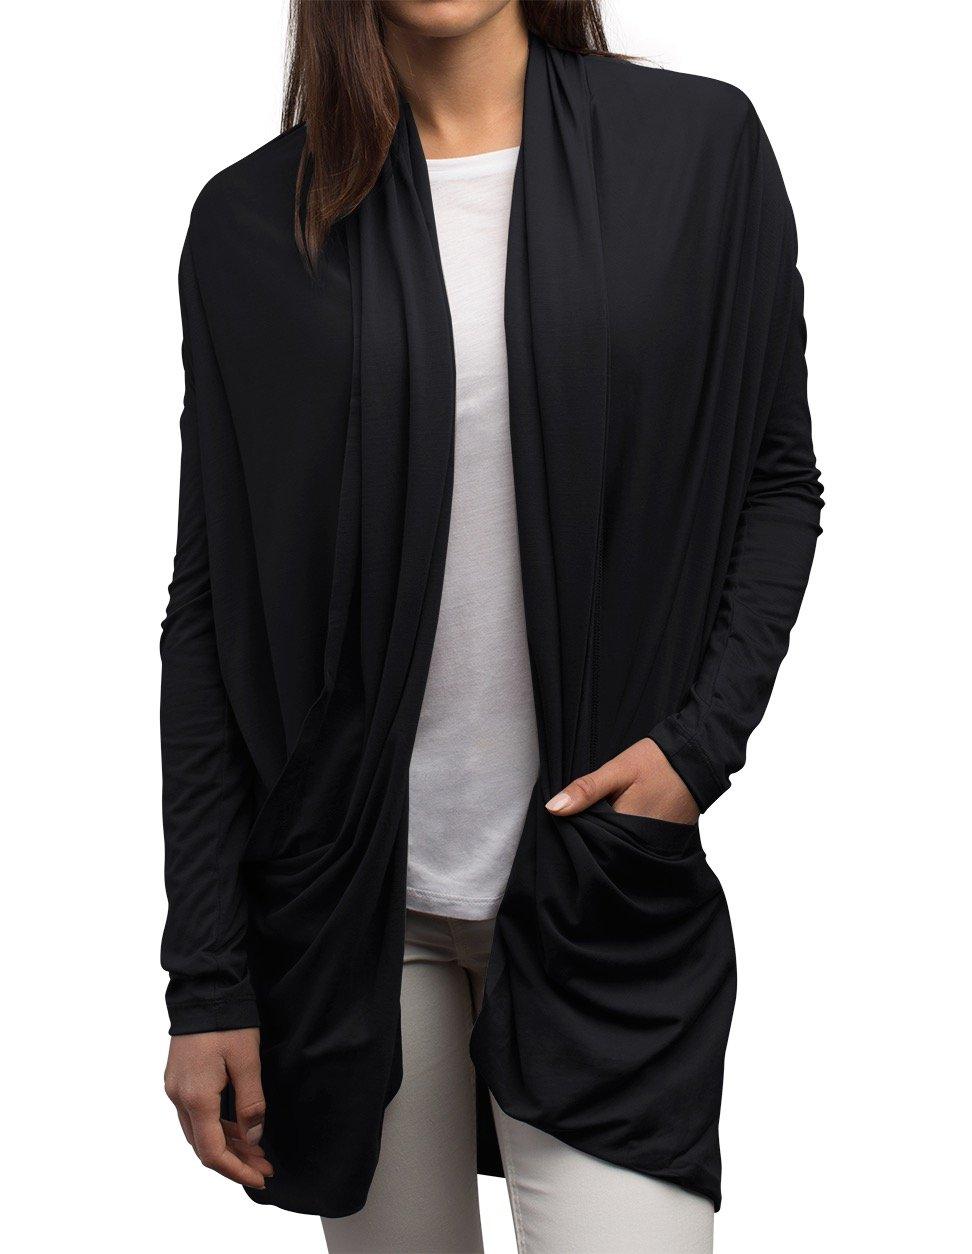 SCOTTeVEST Madeline Cardigan - 4 Pockets - Travel Clothing, Sweater BLK 2XL